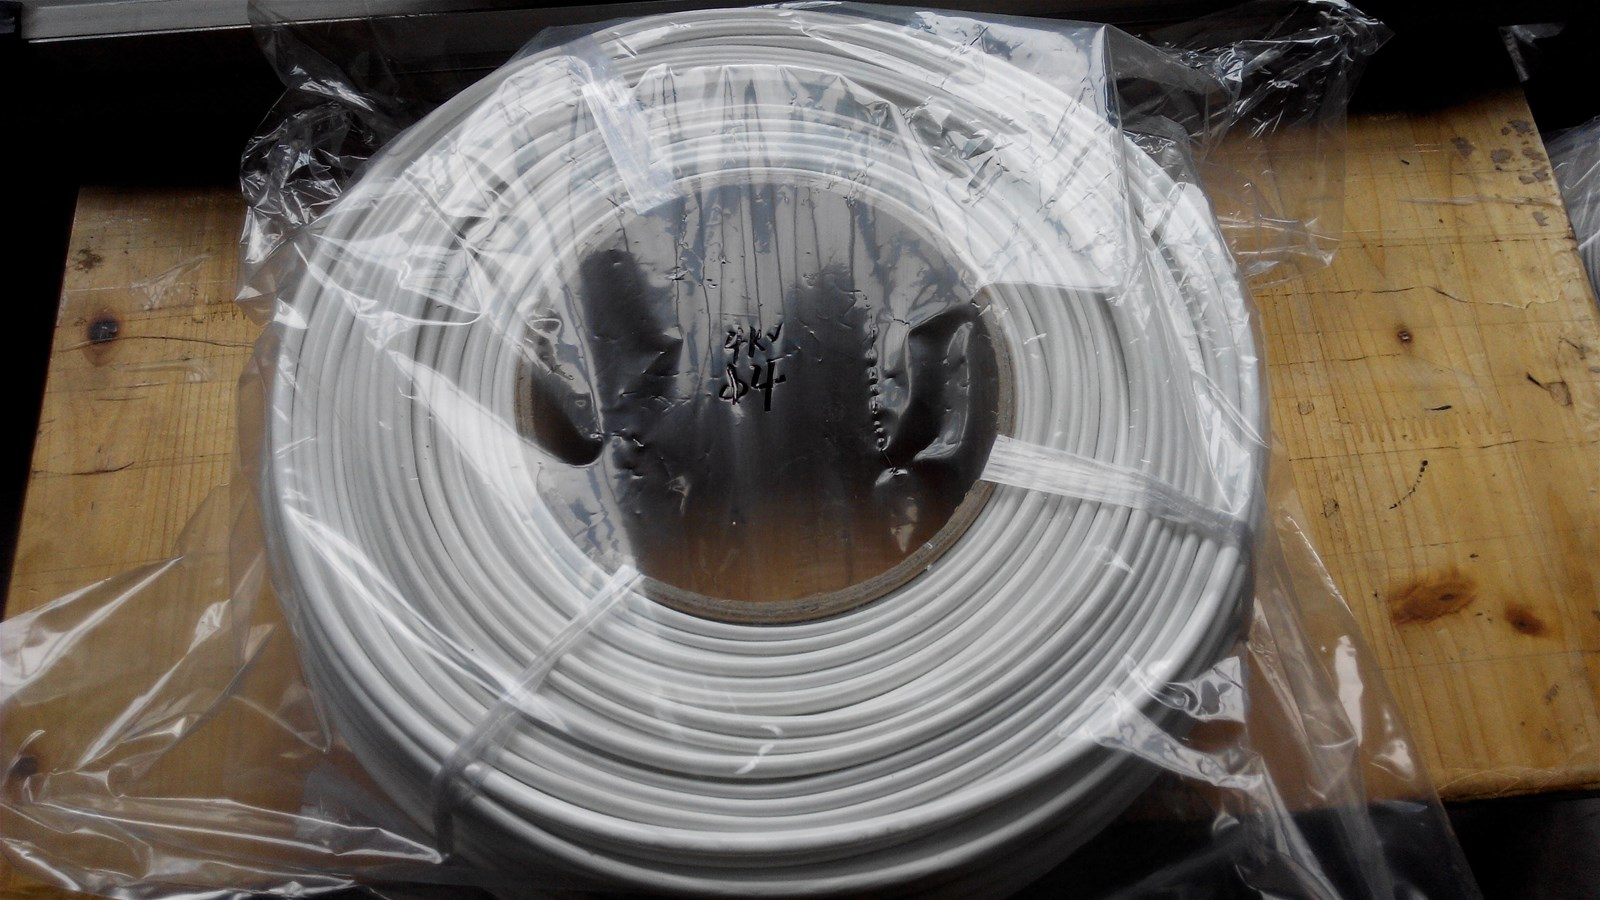 insulation fiberglass sleeving